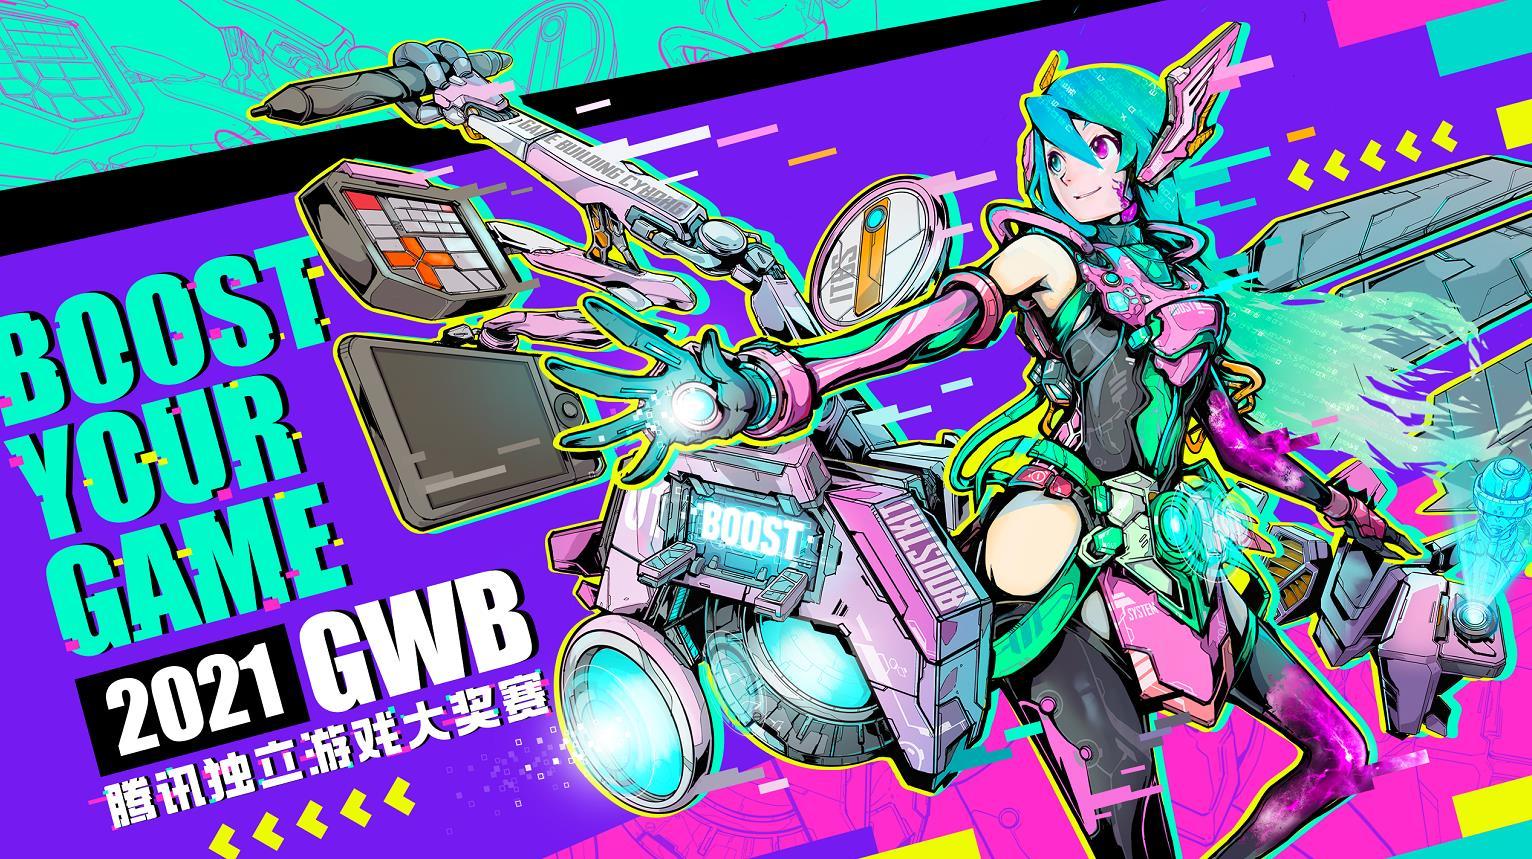 2021GWB腾讯独立游戏大奖赛正式启动,让独立游戏绽放无限可能-Gamewower